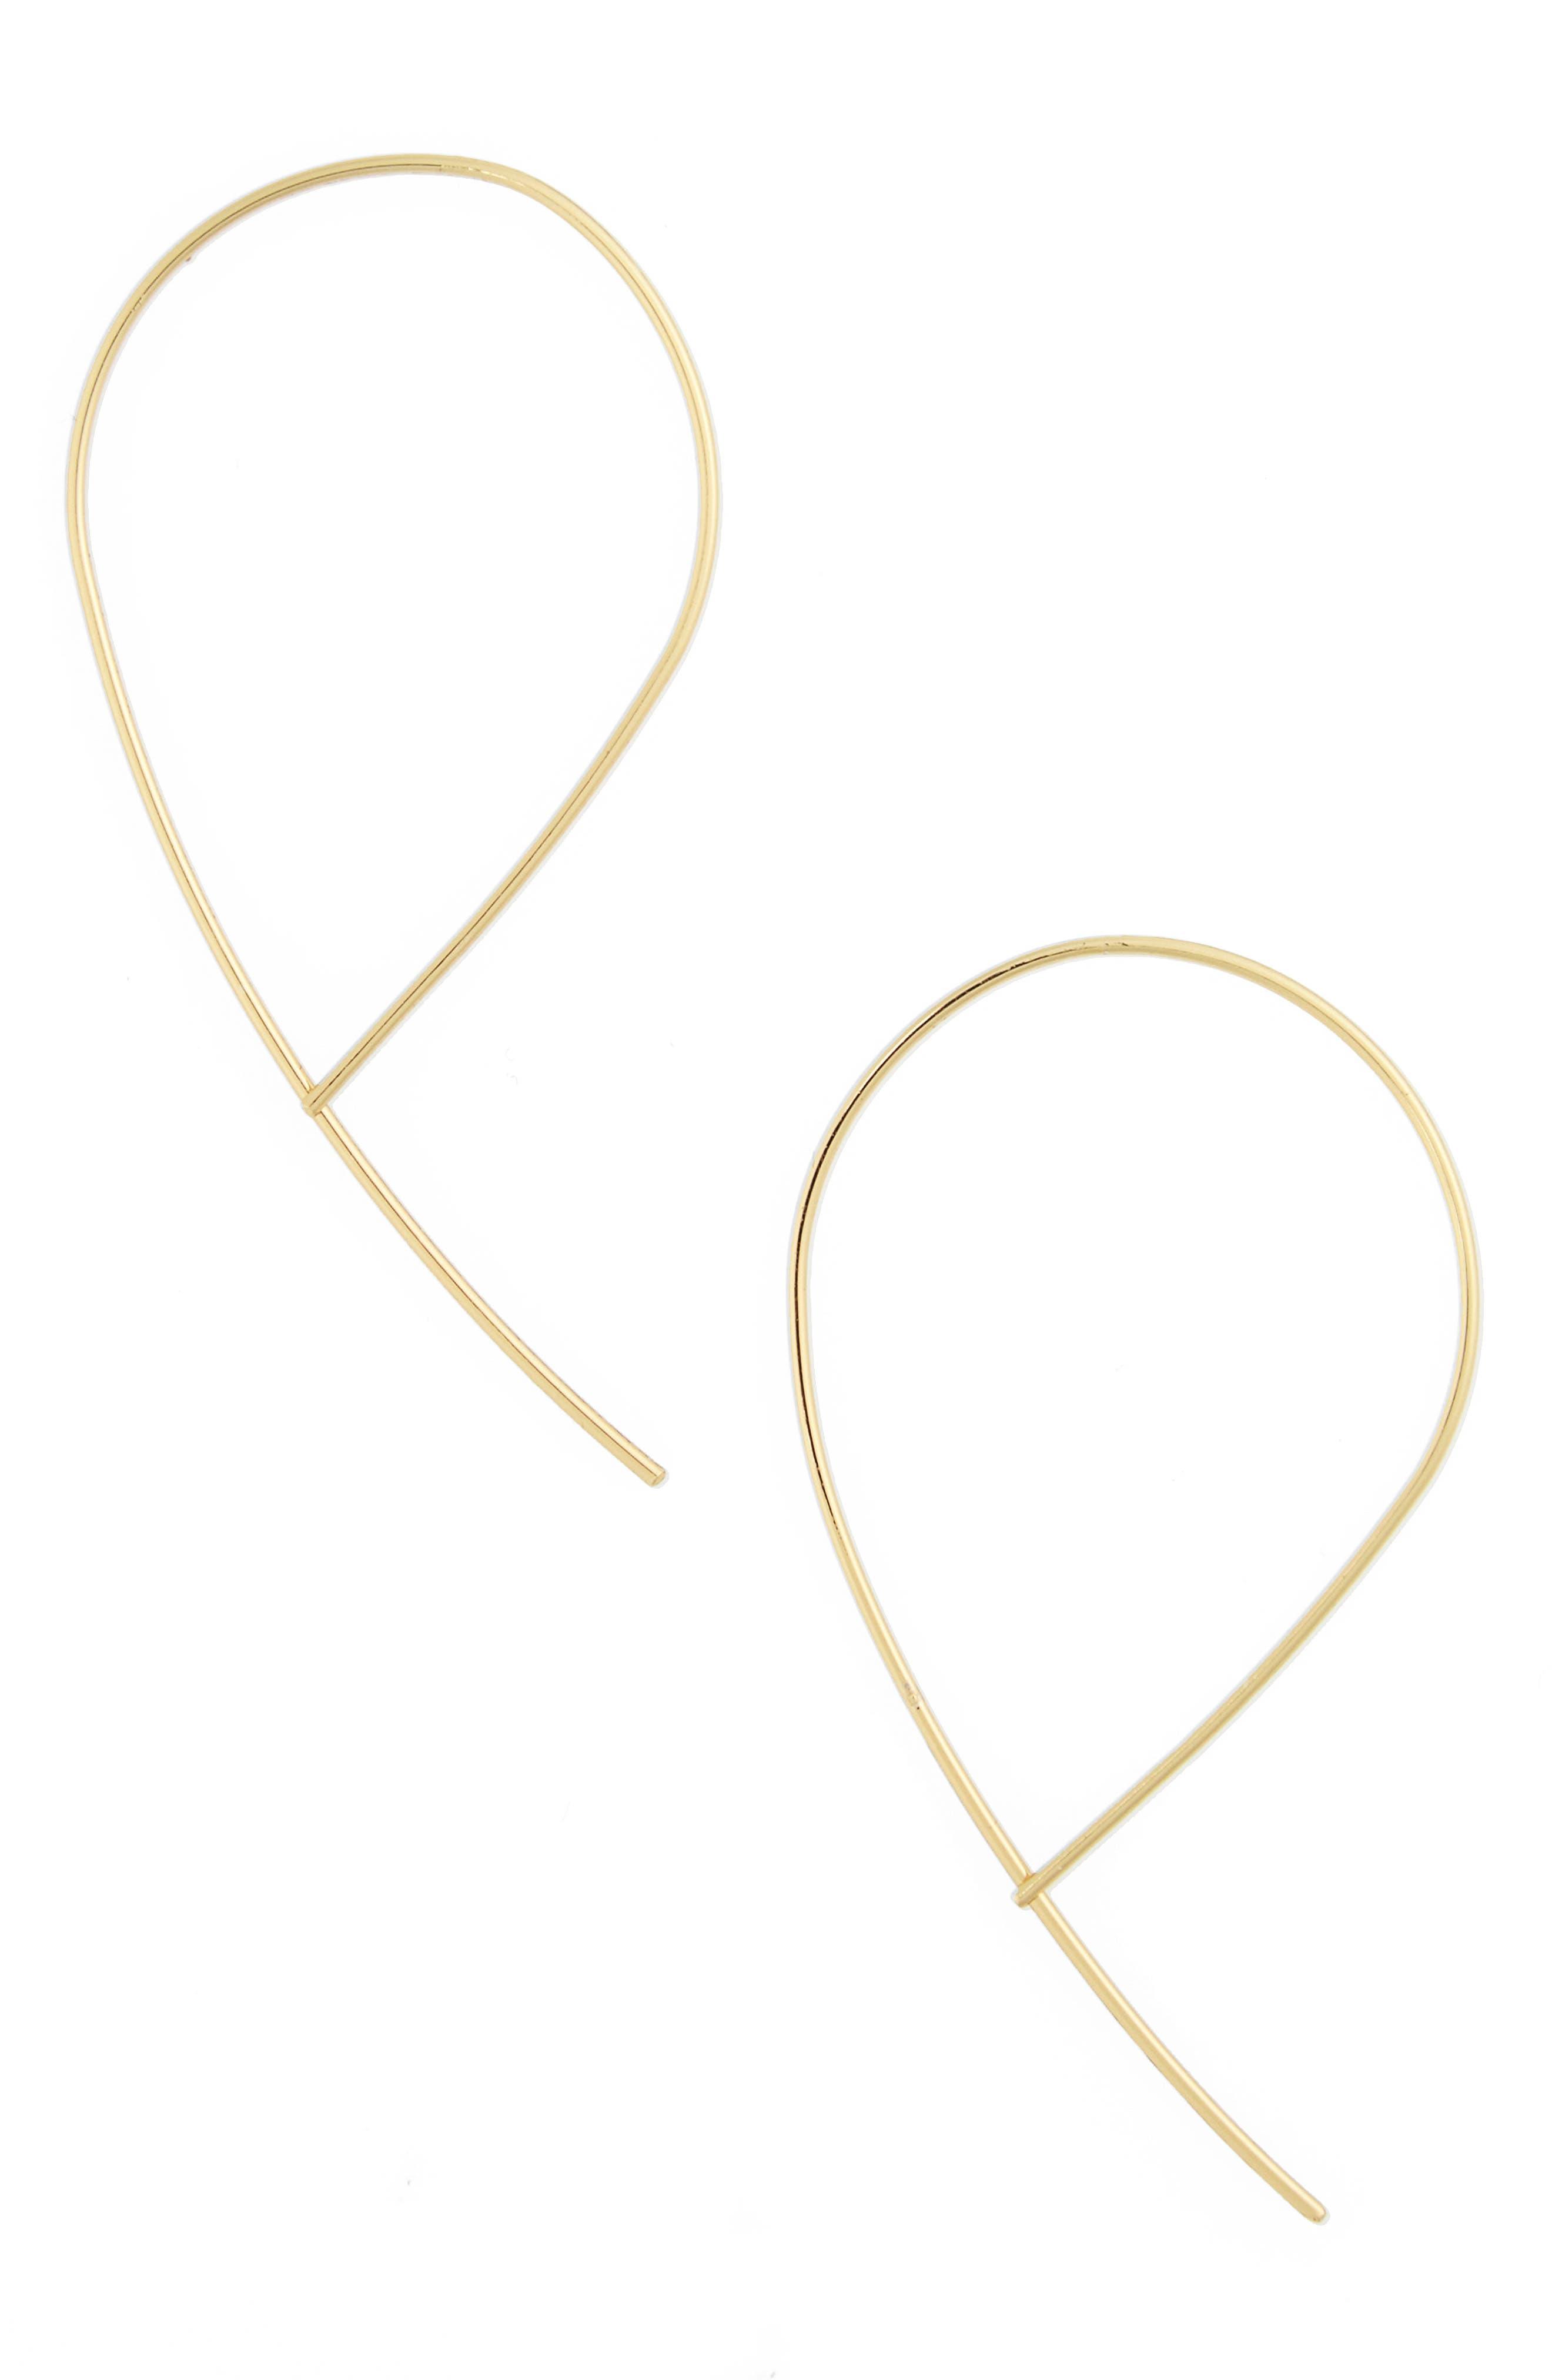 BAUBLEBAR, Arie Threader Earrings, Main thumbnail 1, color, GOLD